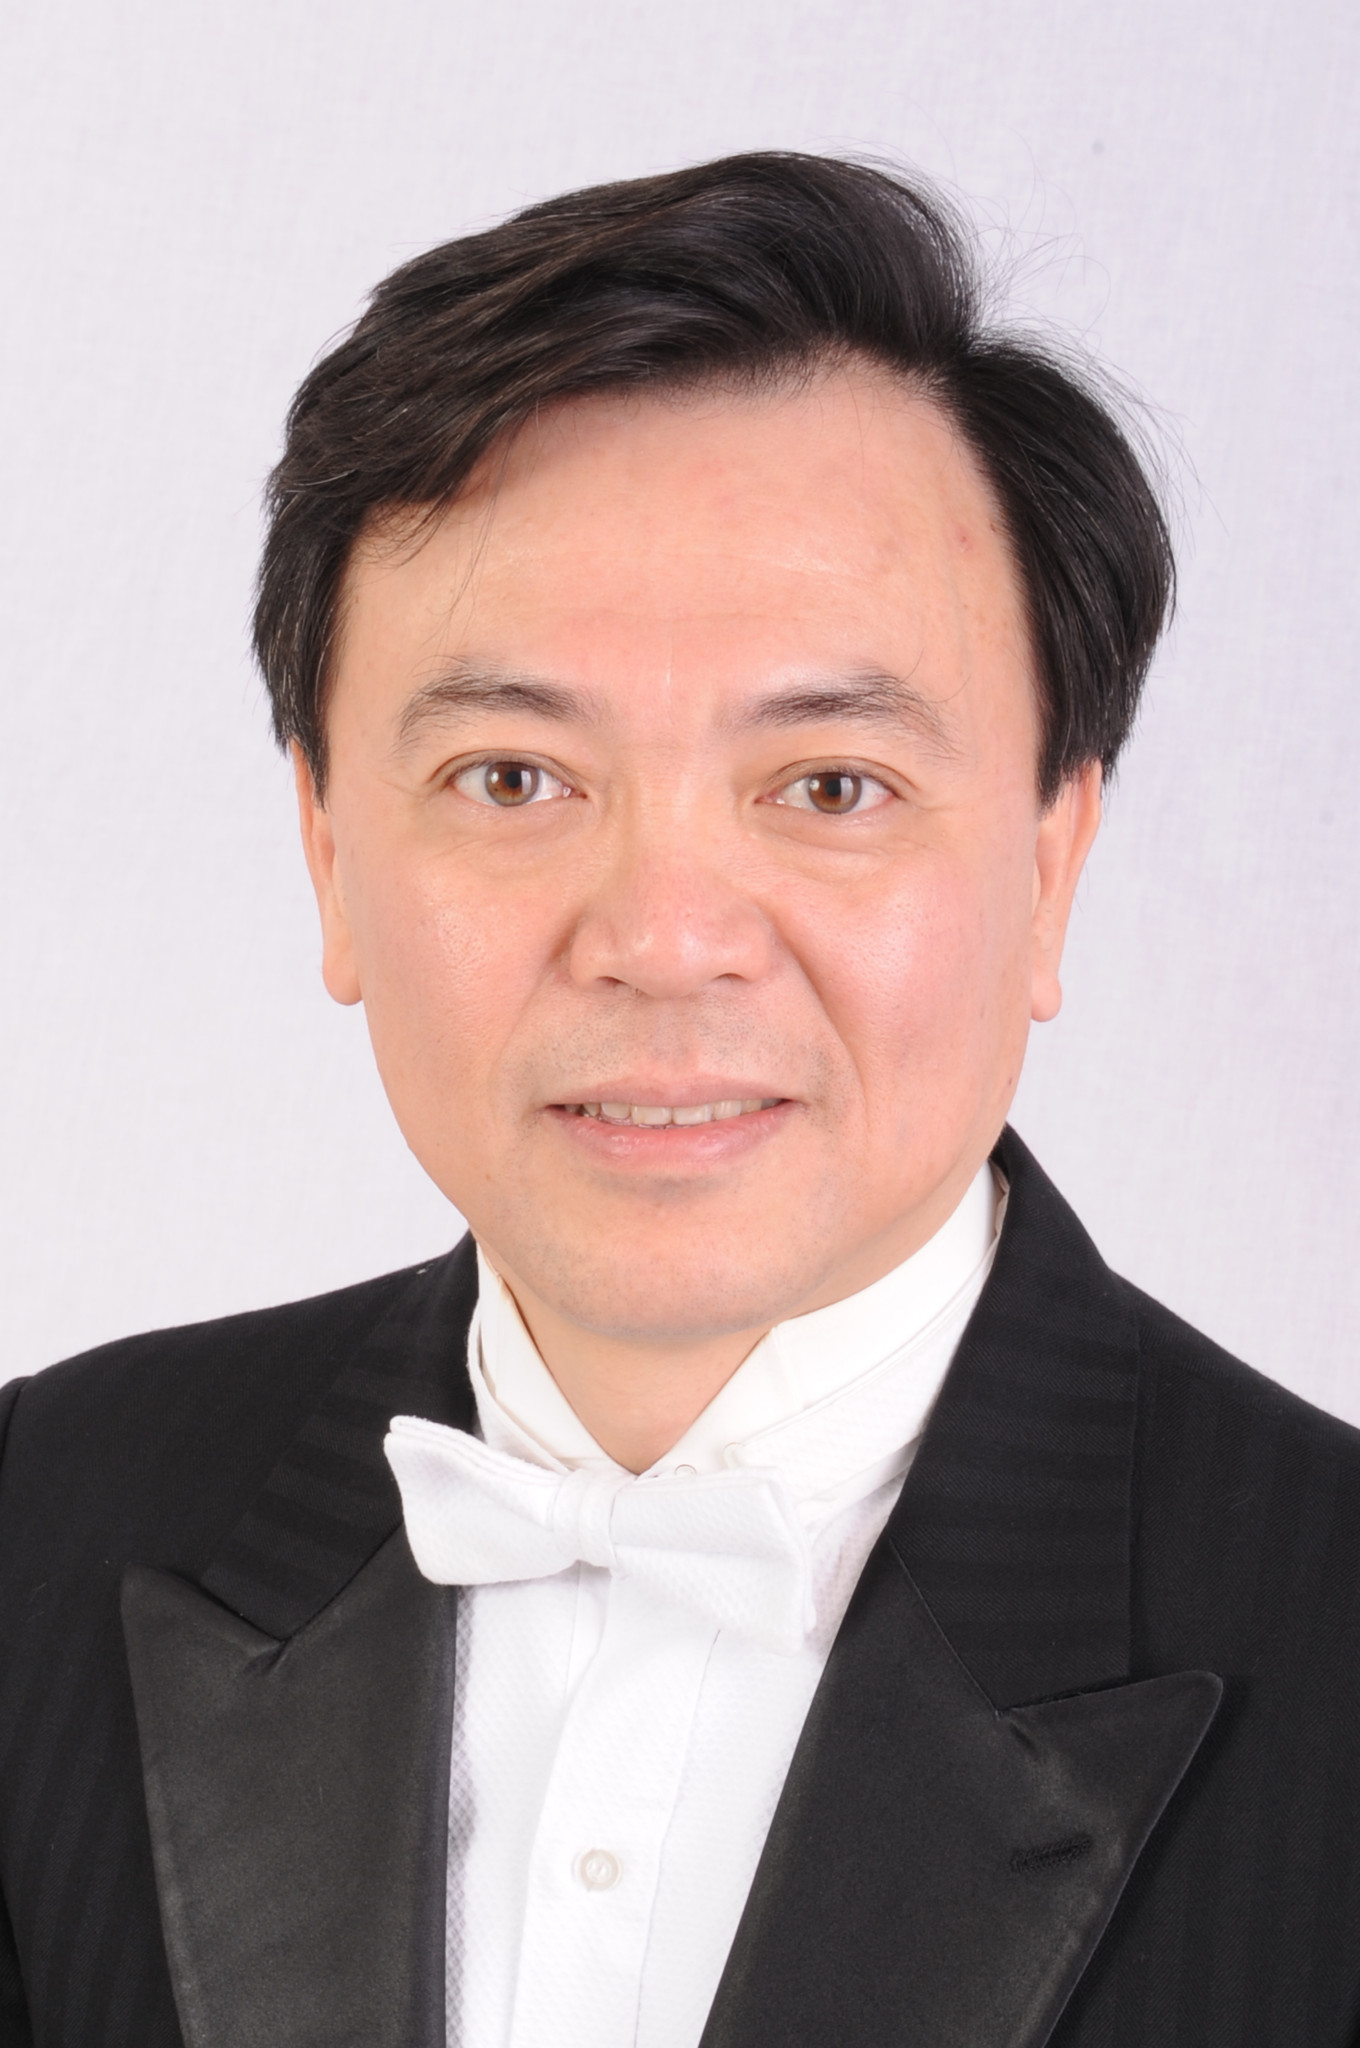 Joseph Hu plays Pong